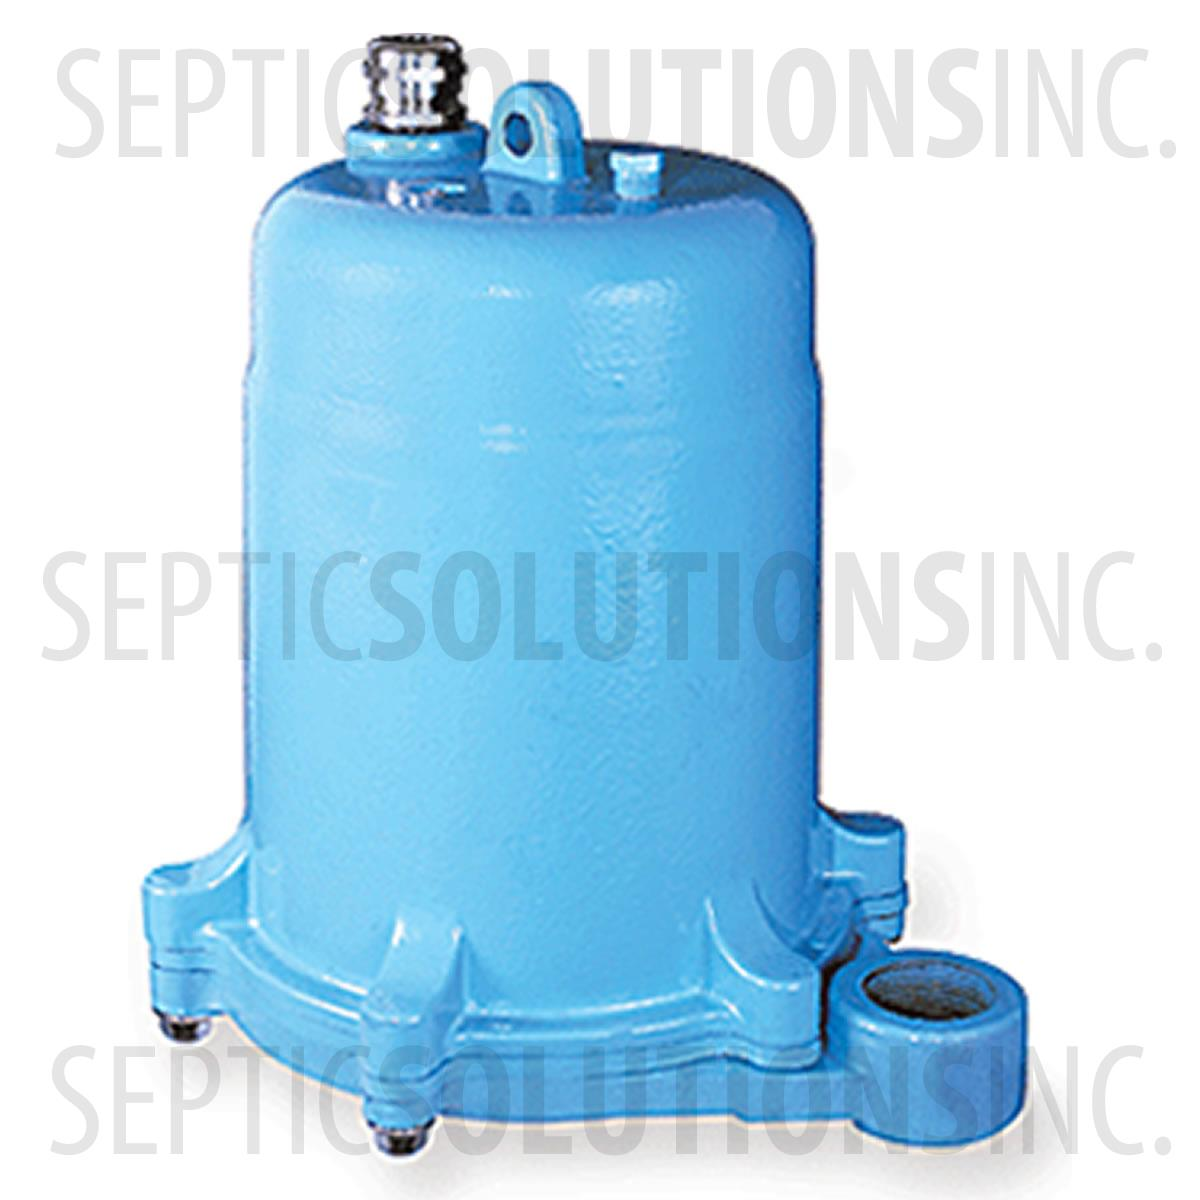 Little Giant Model Gp M231 15 2 0 Hp Submersible Sewage